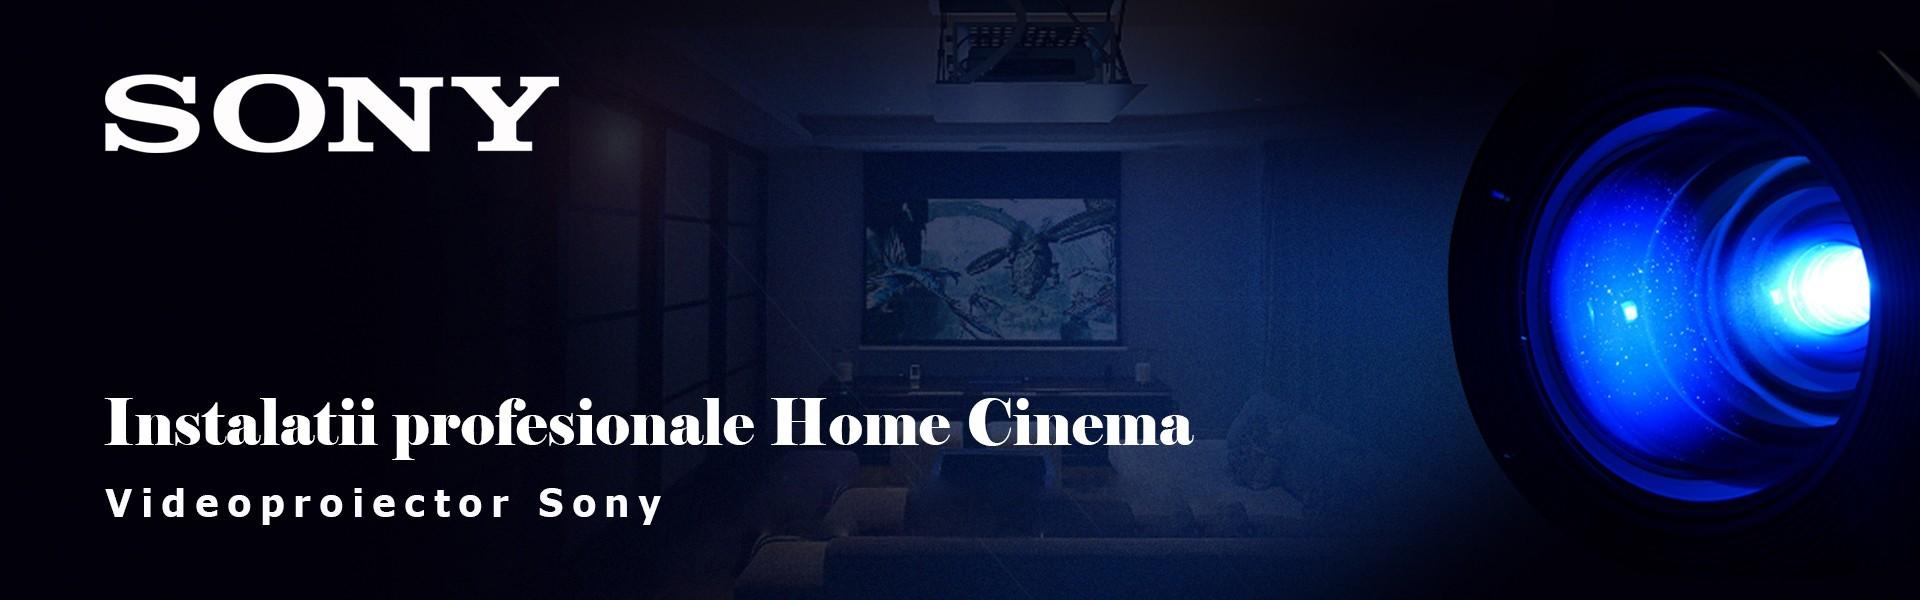 instalatii_profesionale_home_cinema_videoproiector_sony_proiector24_gbc